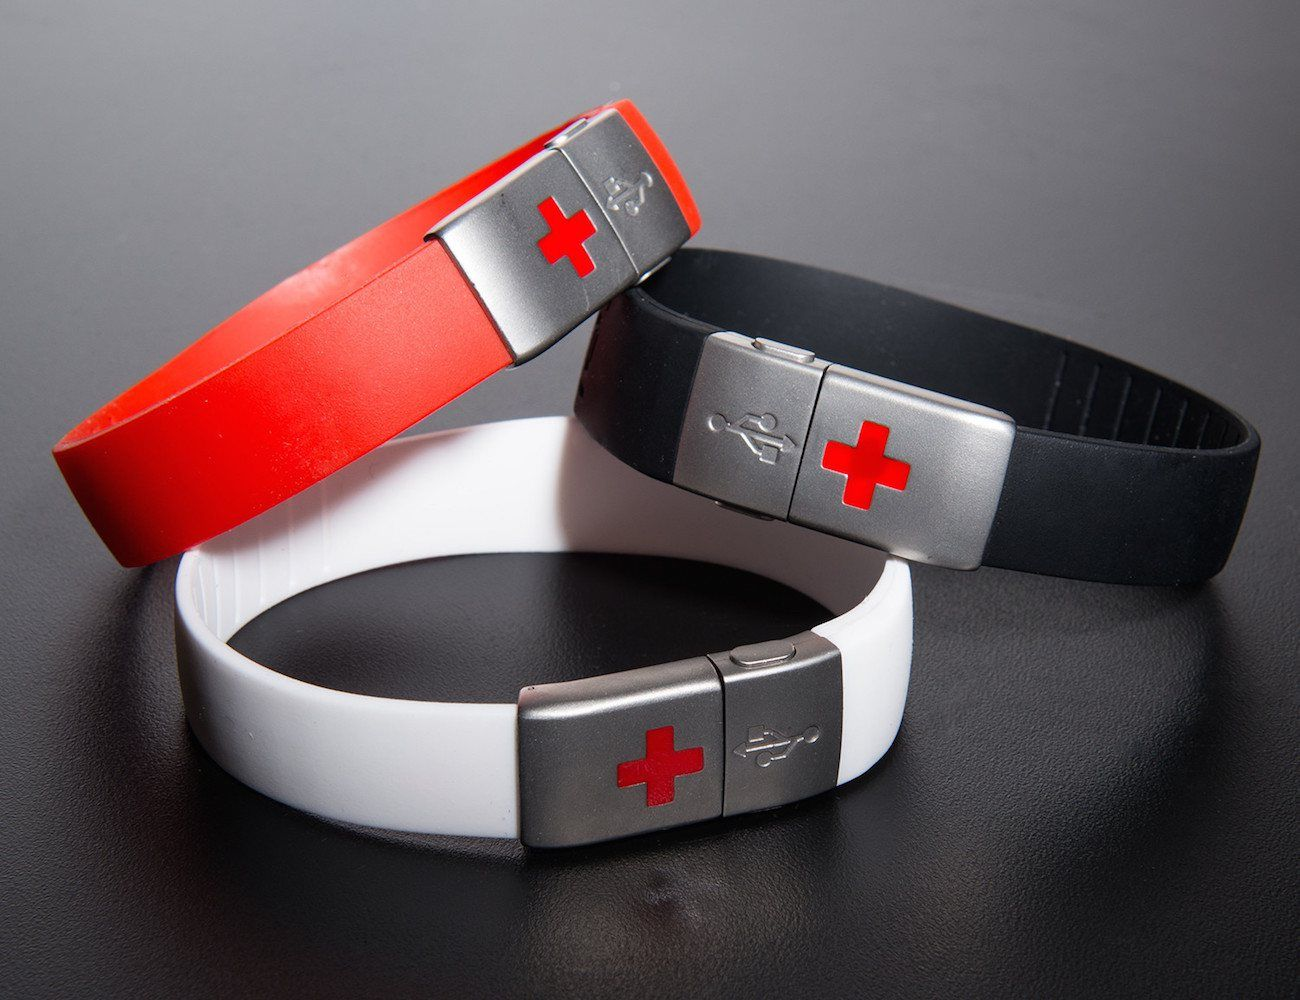 Epic Id Usb Emergency Id Wristband Medic Alert Bracelets Med Alert Bracelet Medical Bracelet